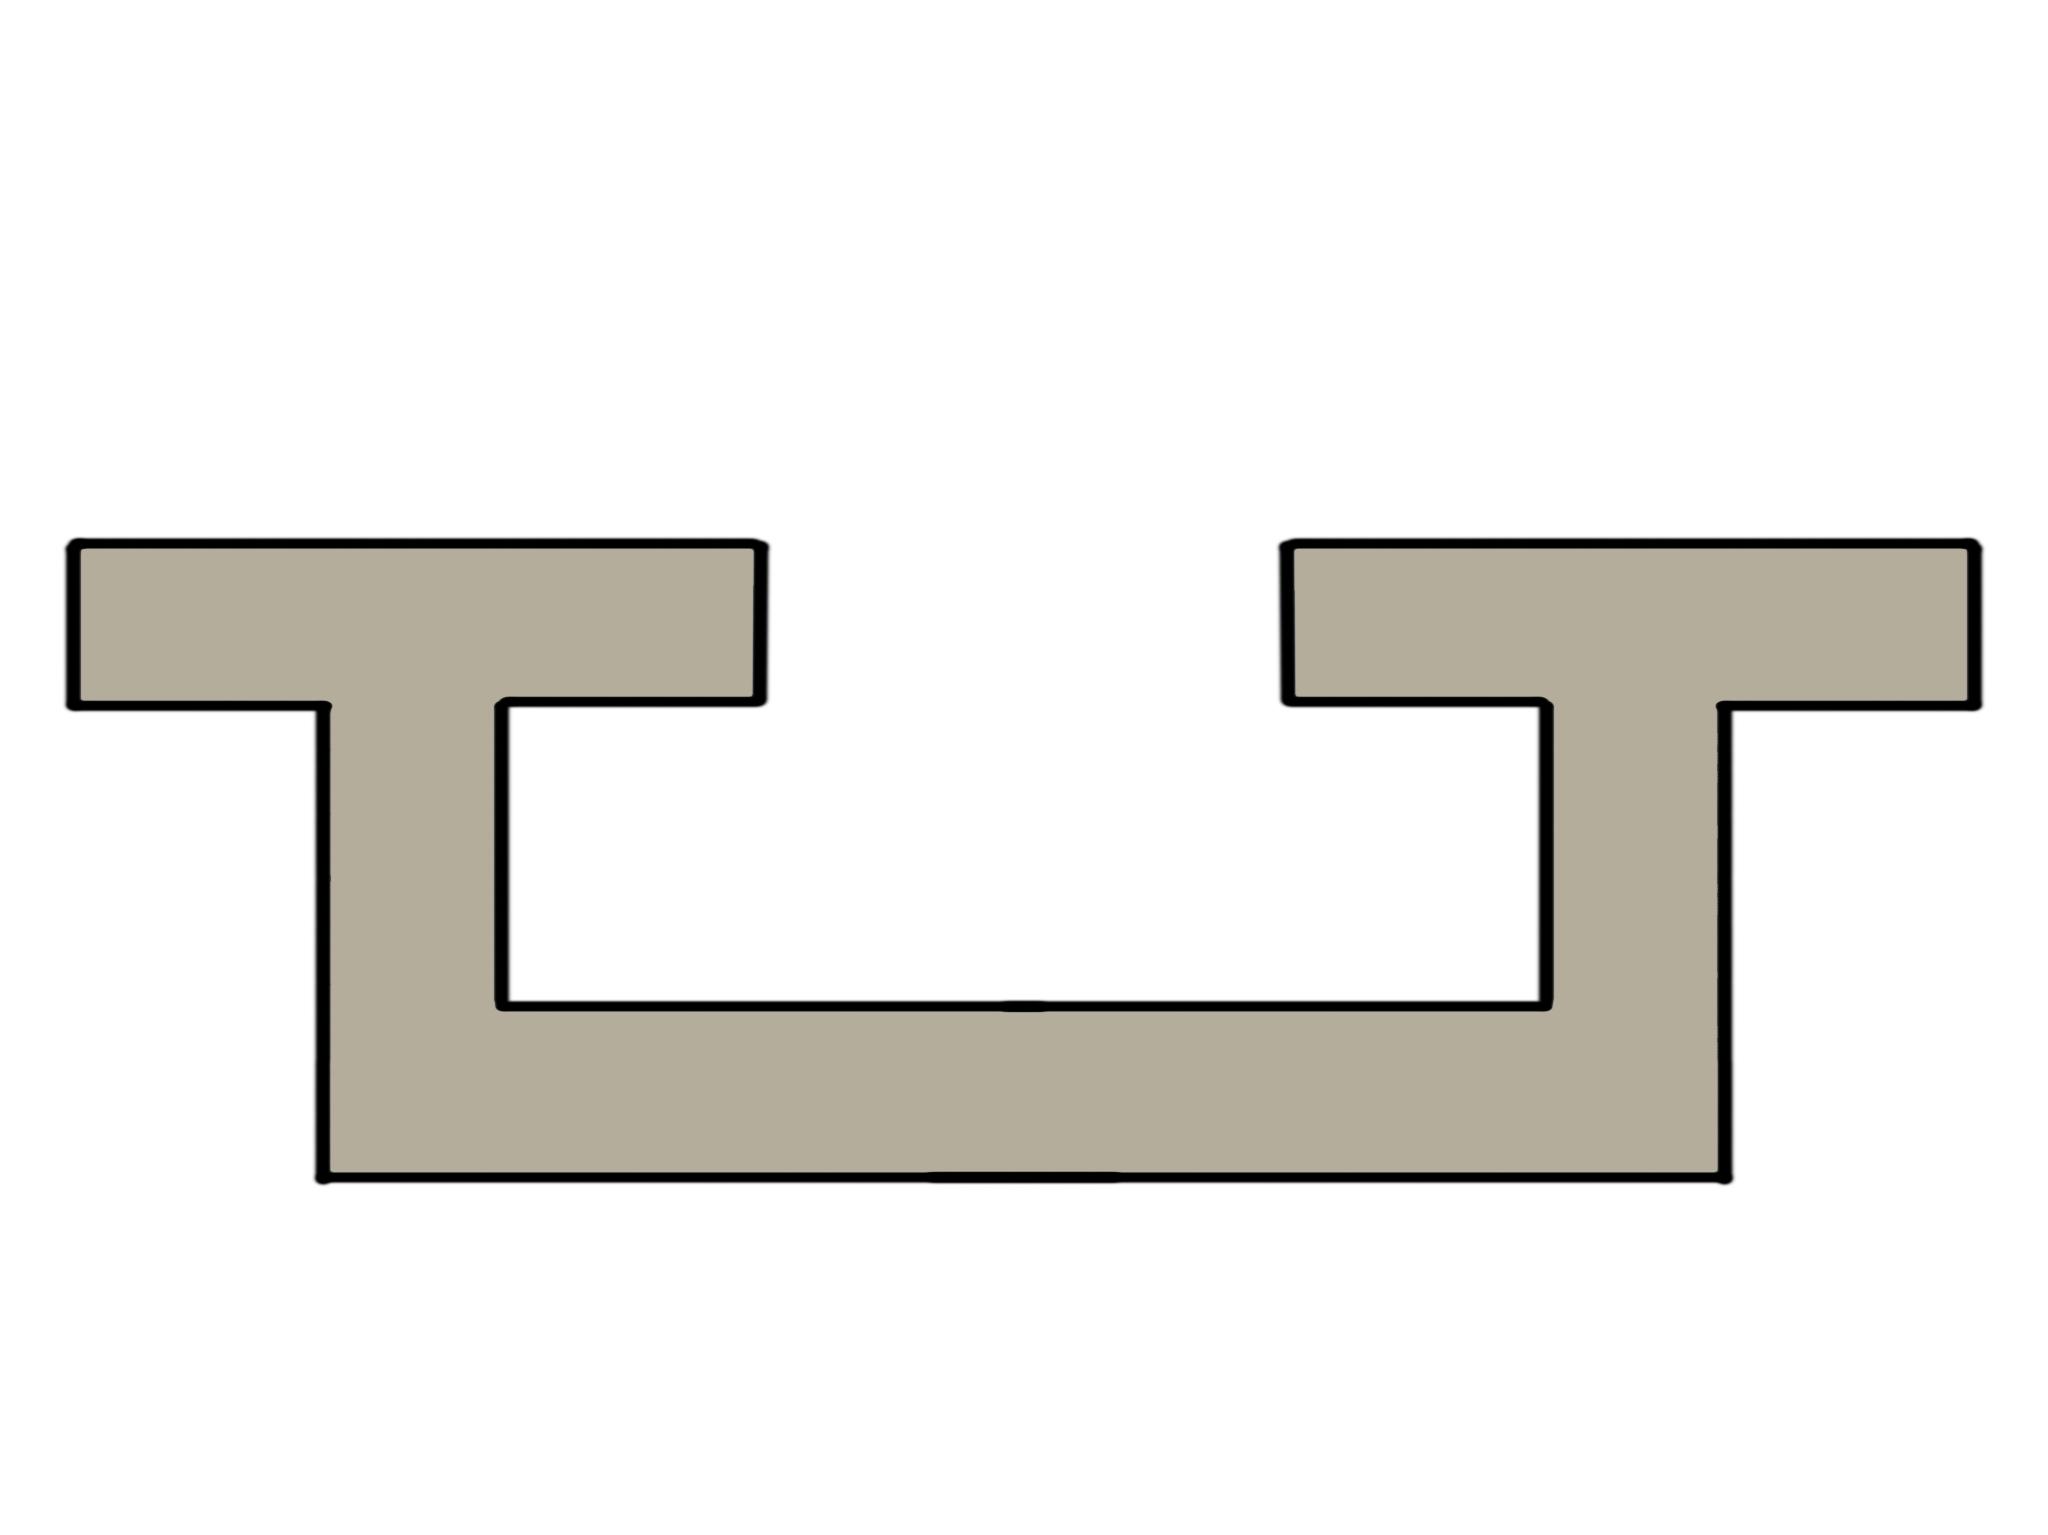 Extrusion process bolt channels